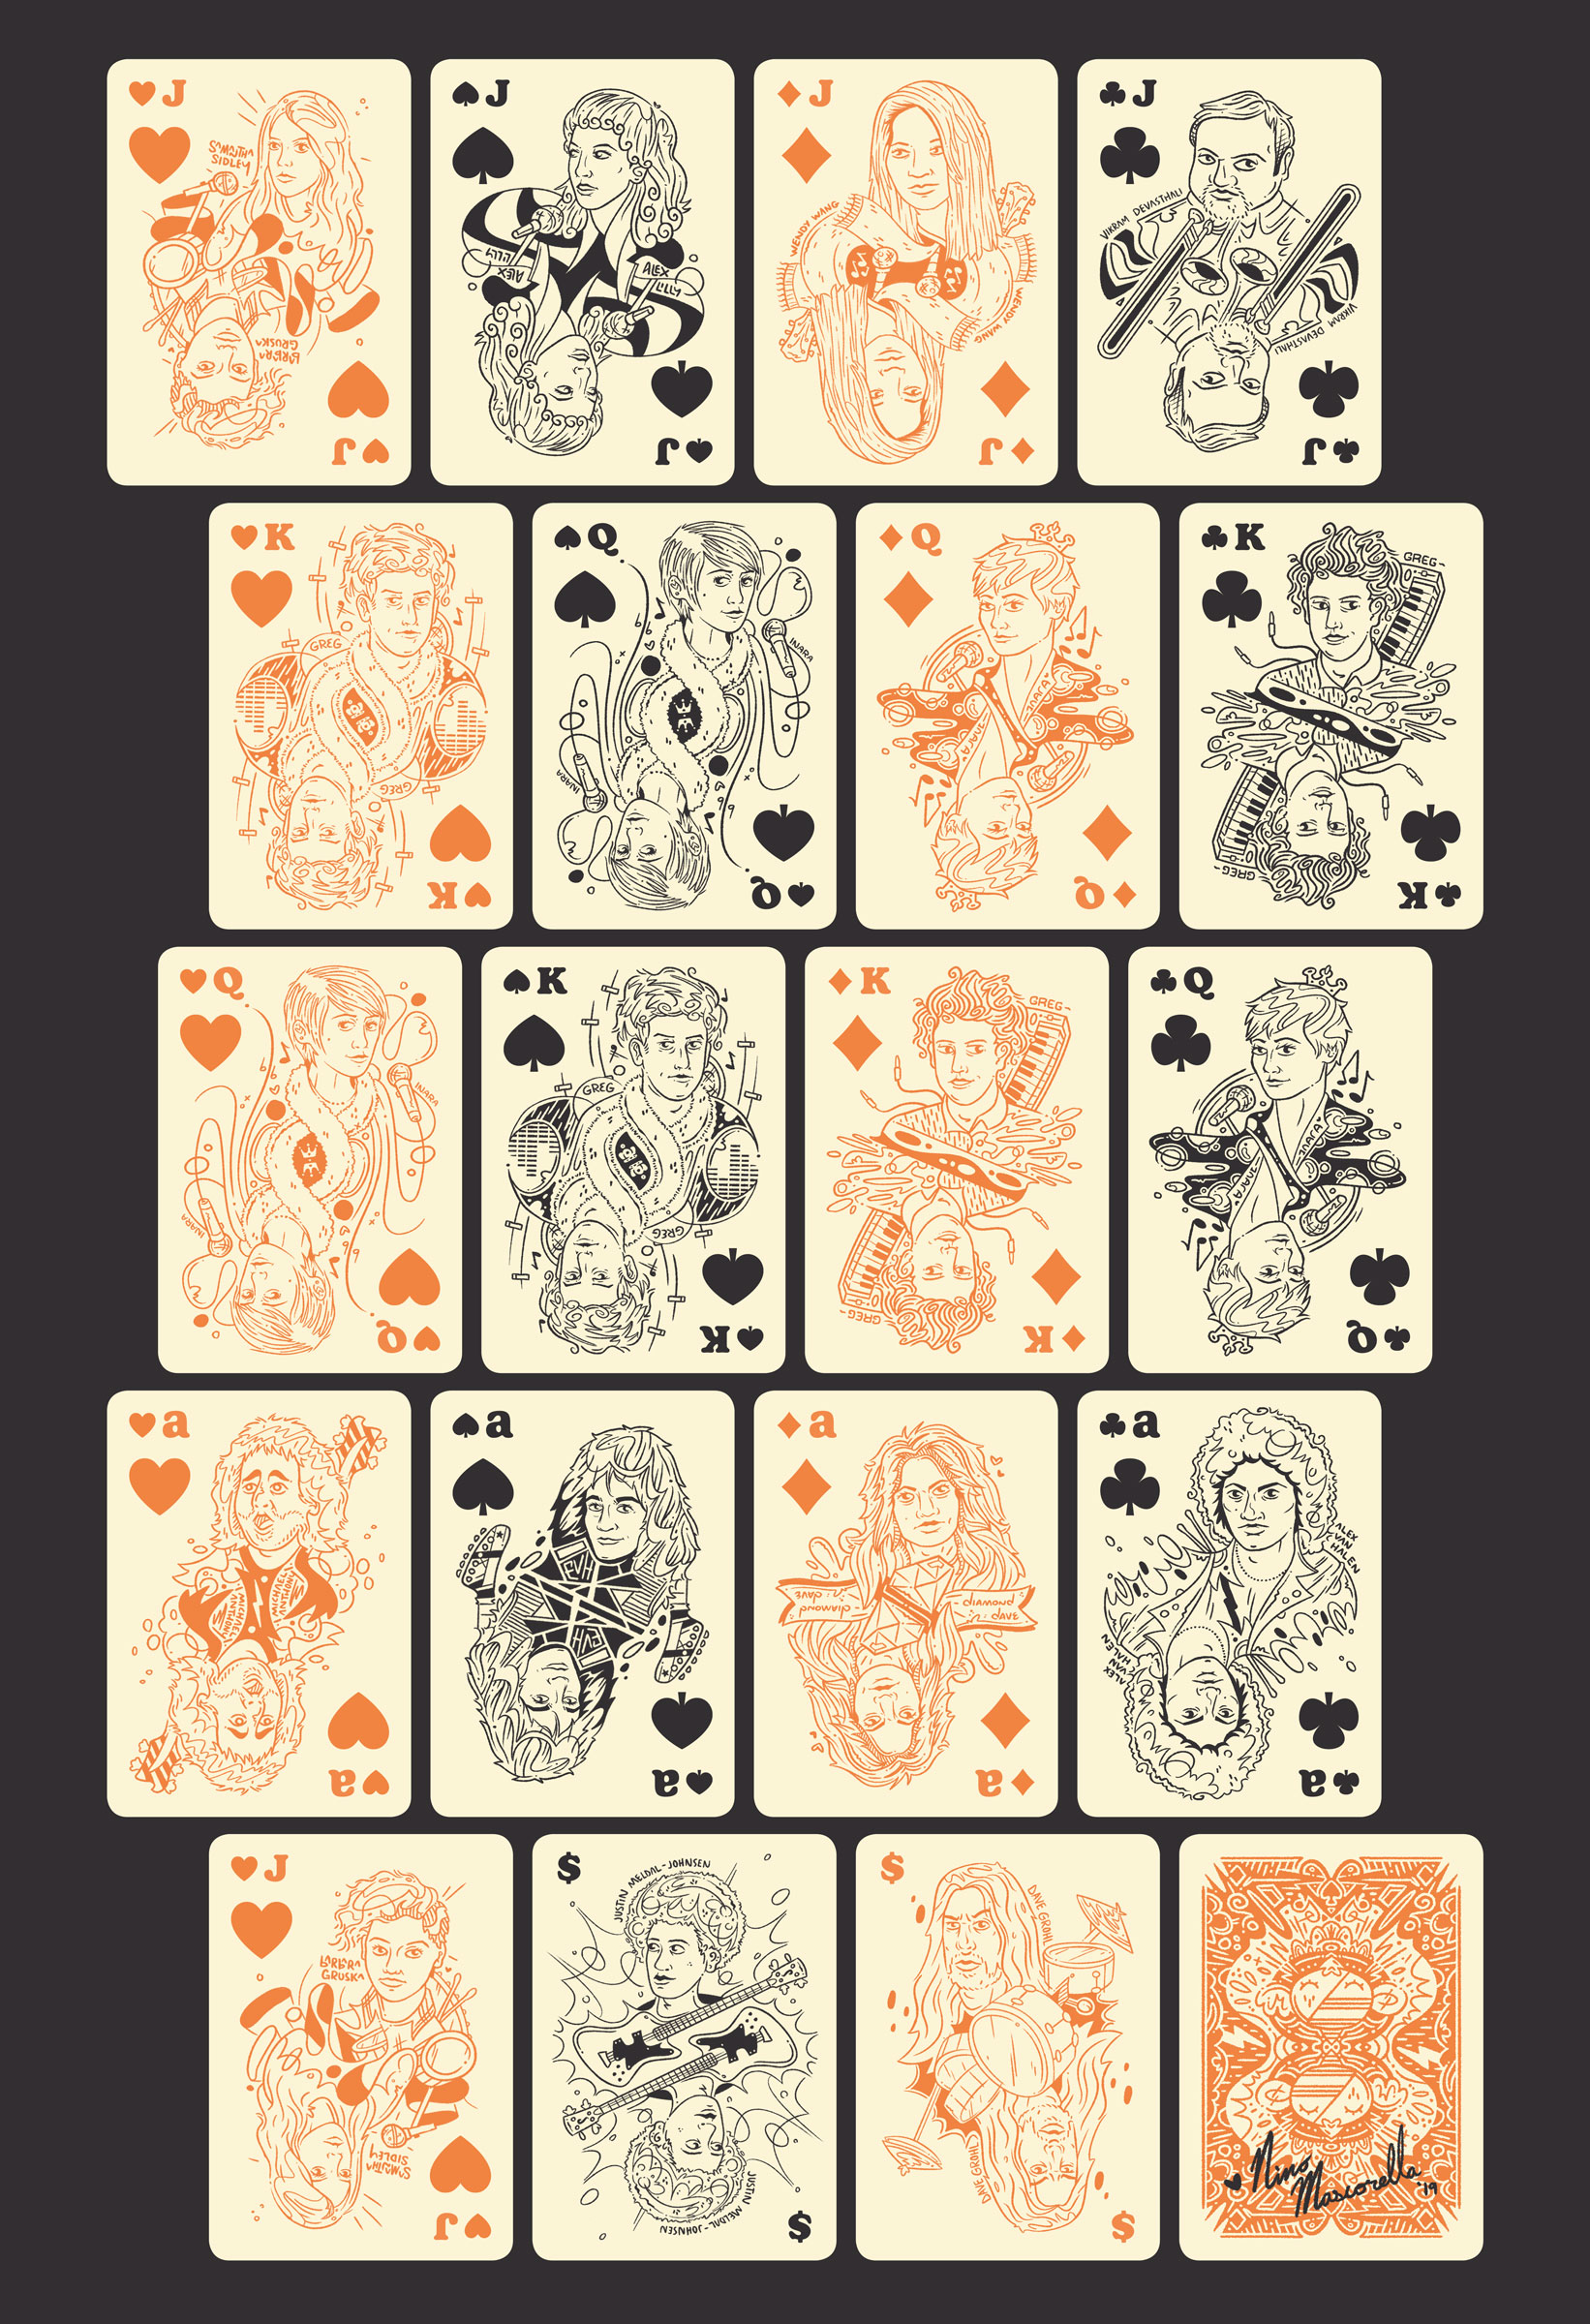 bnb_cardposter